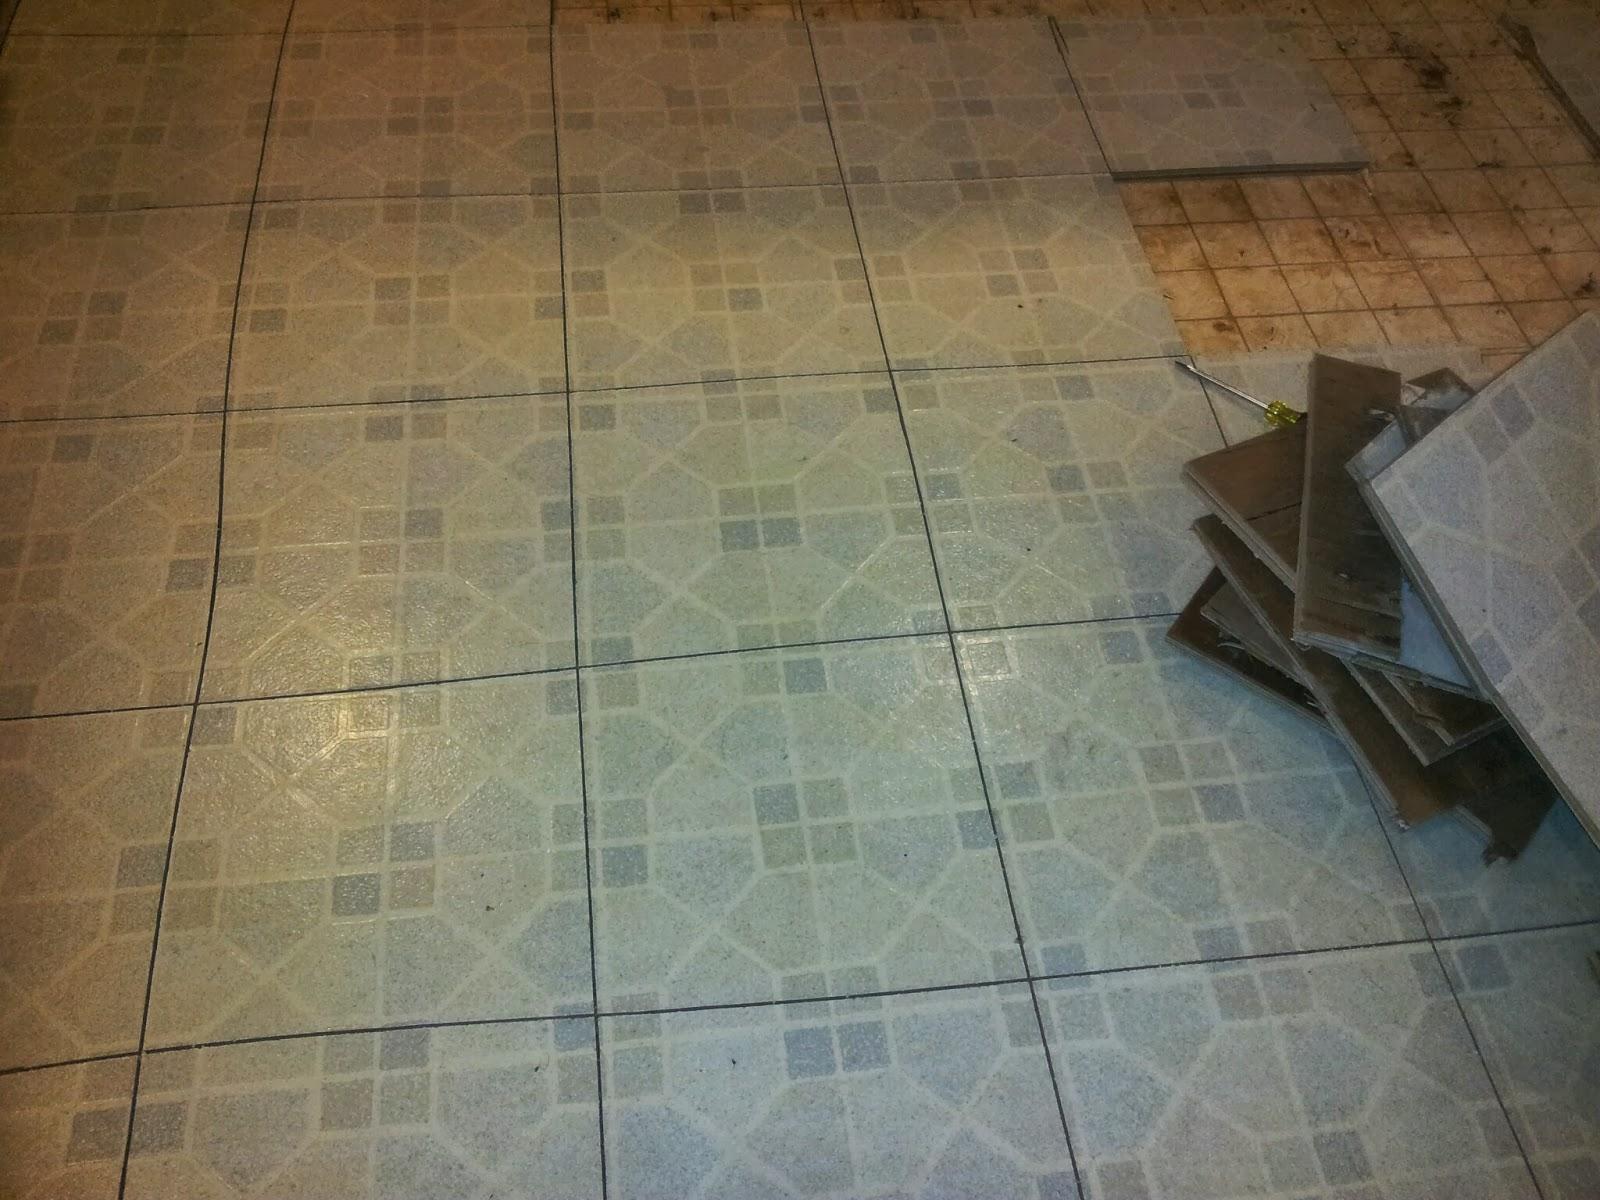 Our Kitchen Floor Demolition has Begun | Ian Francis